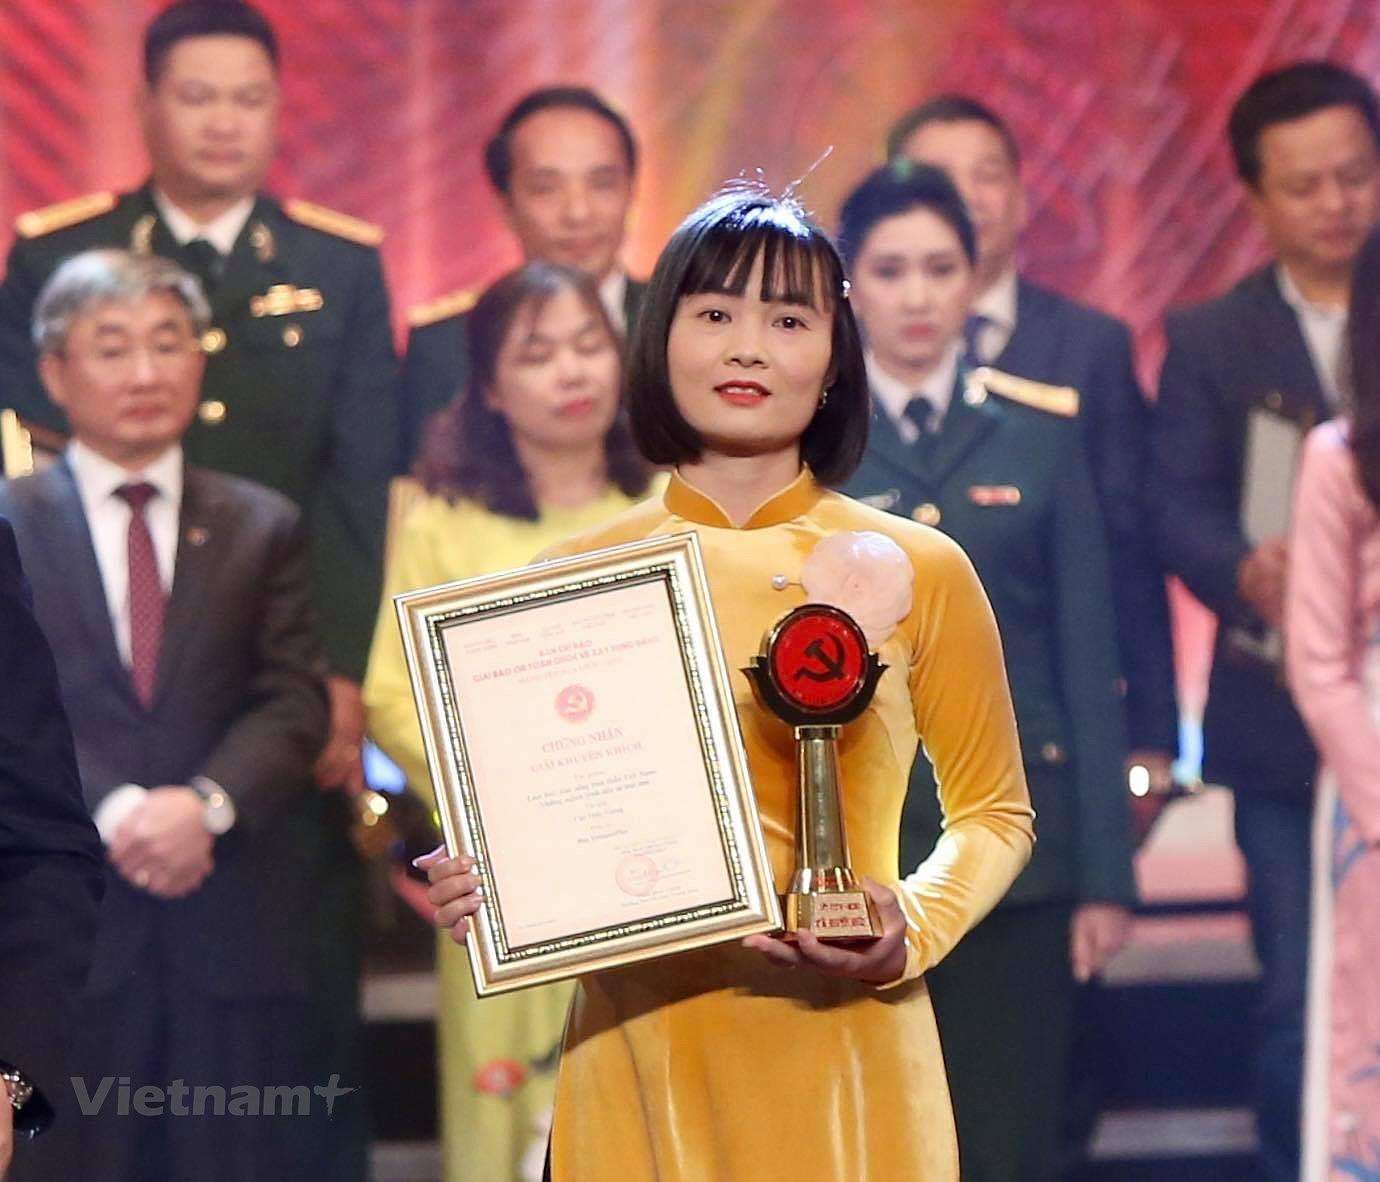 VietnamPlus duoc xuong ten tai Giai bao chi toan quoc ve Xay dung Dang hinh anh 4